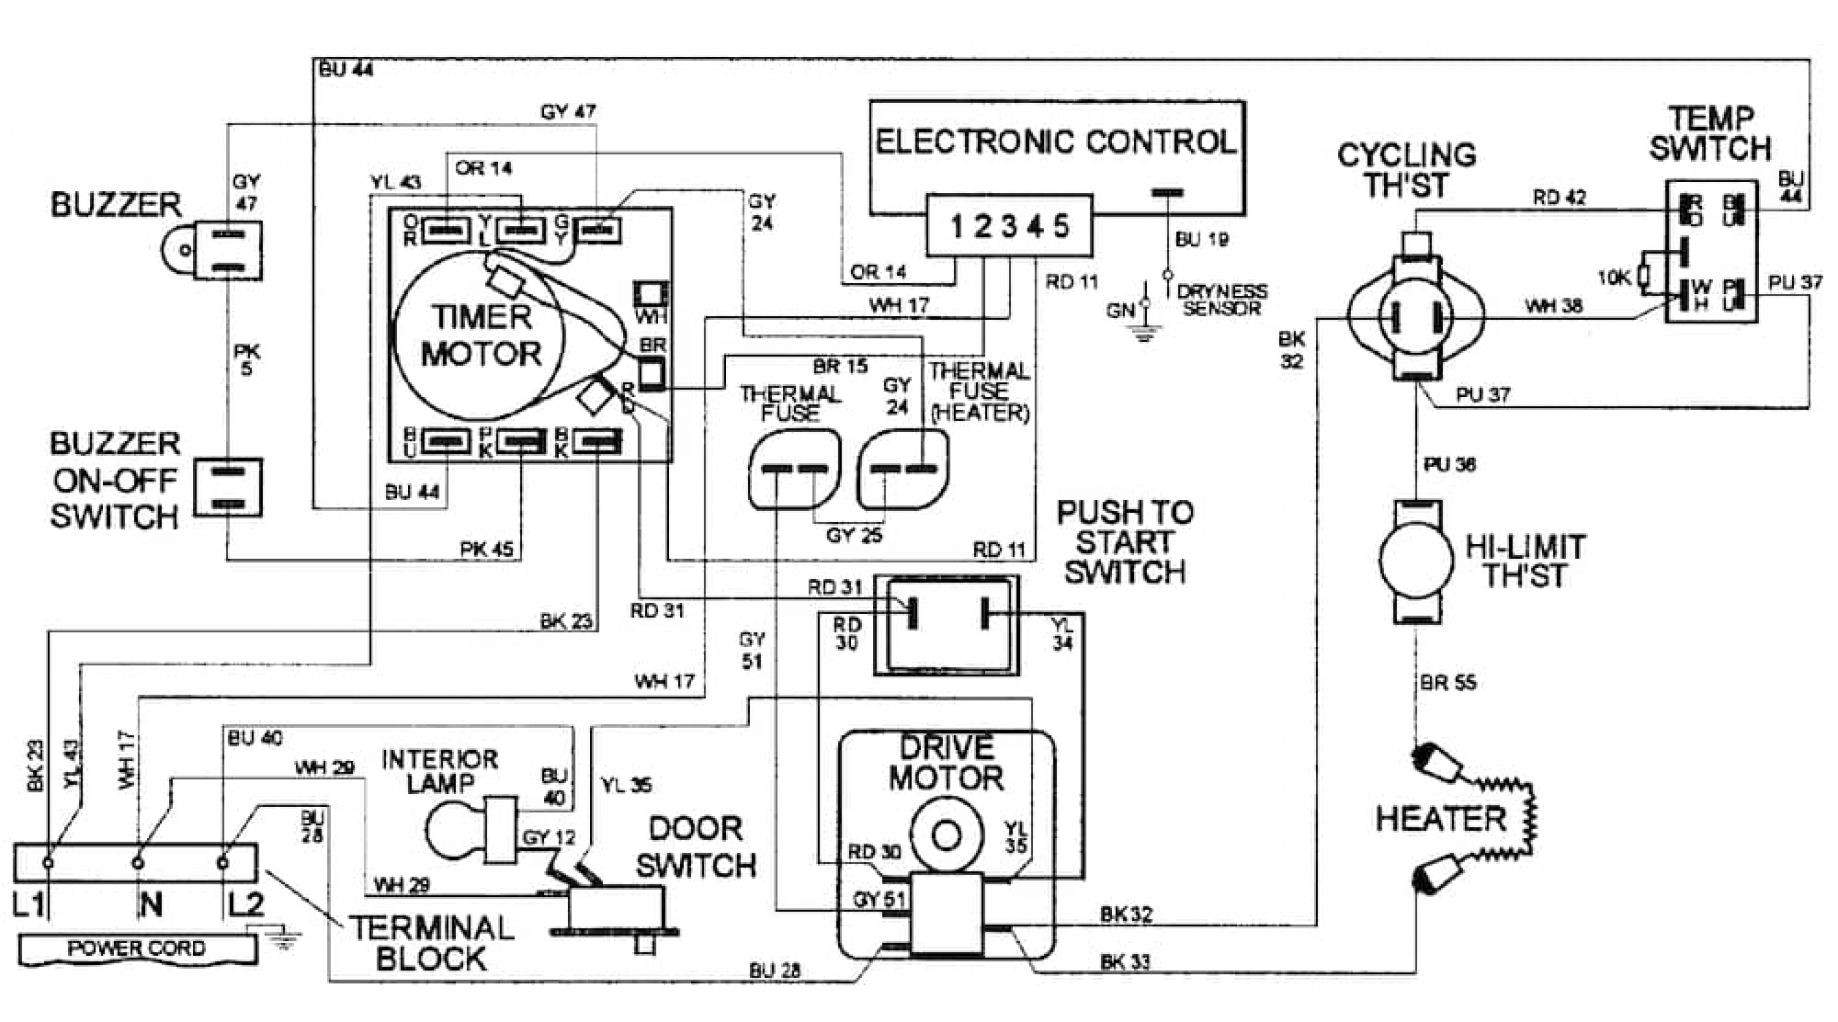 Haier Dryer Wiring Diagram Wiring Diagram Conveyor Belt Wiring Diagram Dryer Wiring Diagram